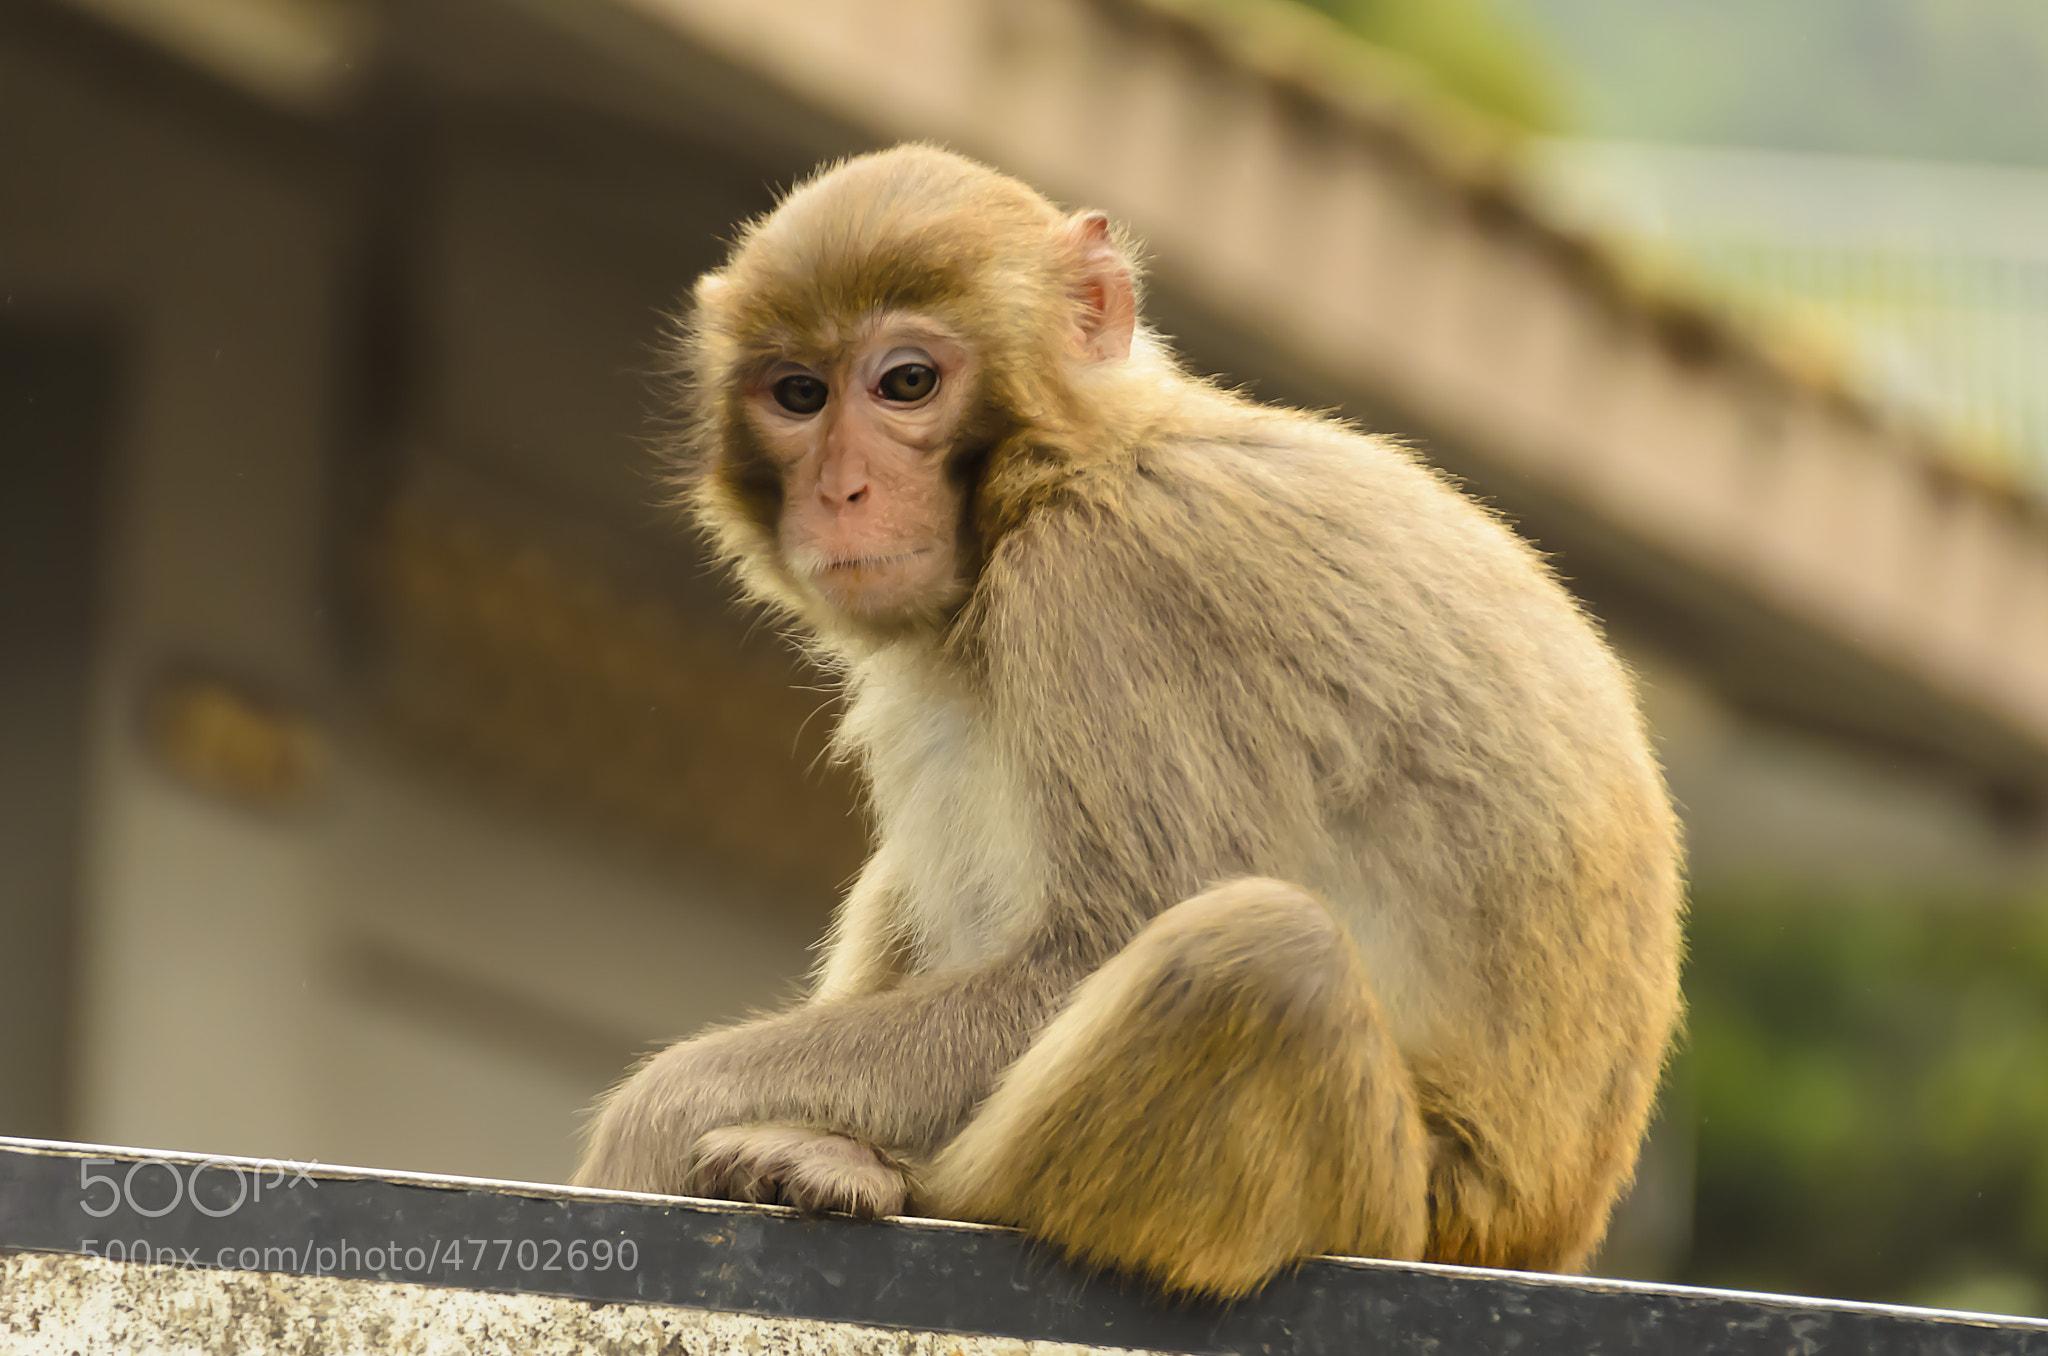 Photograph Hong Kong Macaque by Martijn Barendregt on 500px